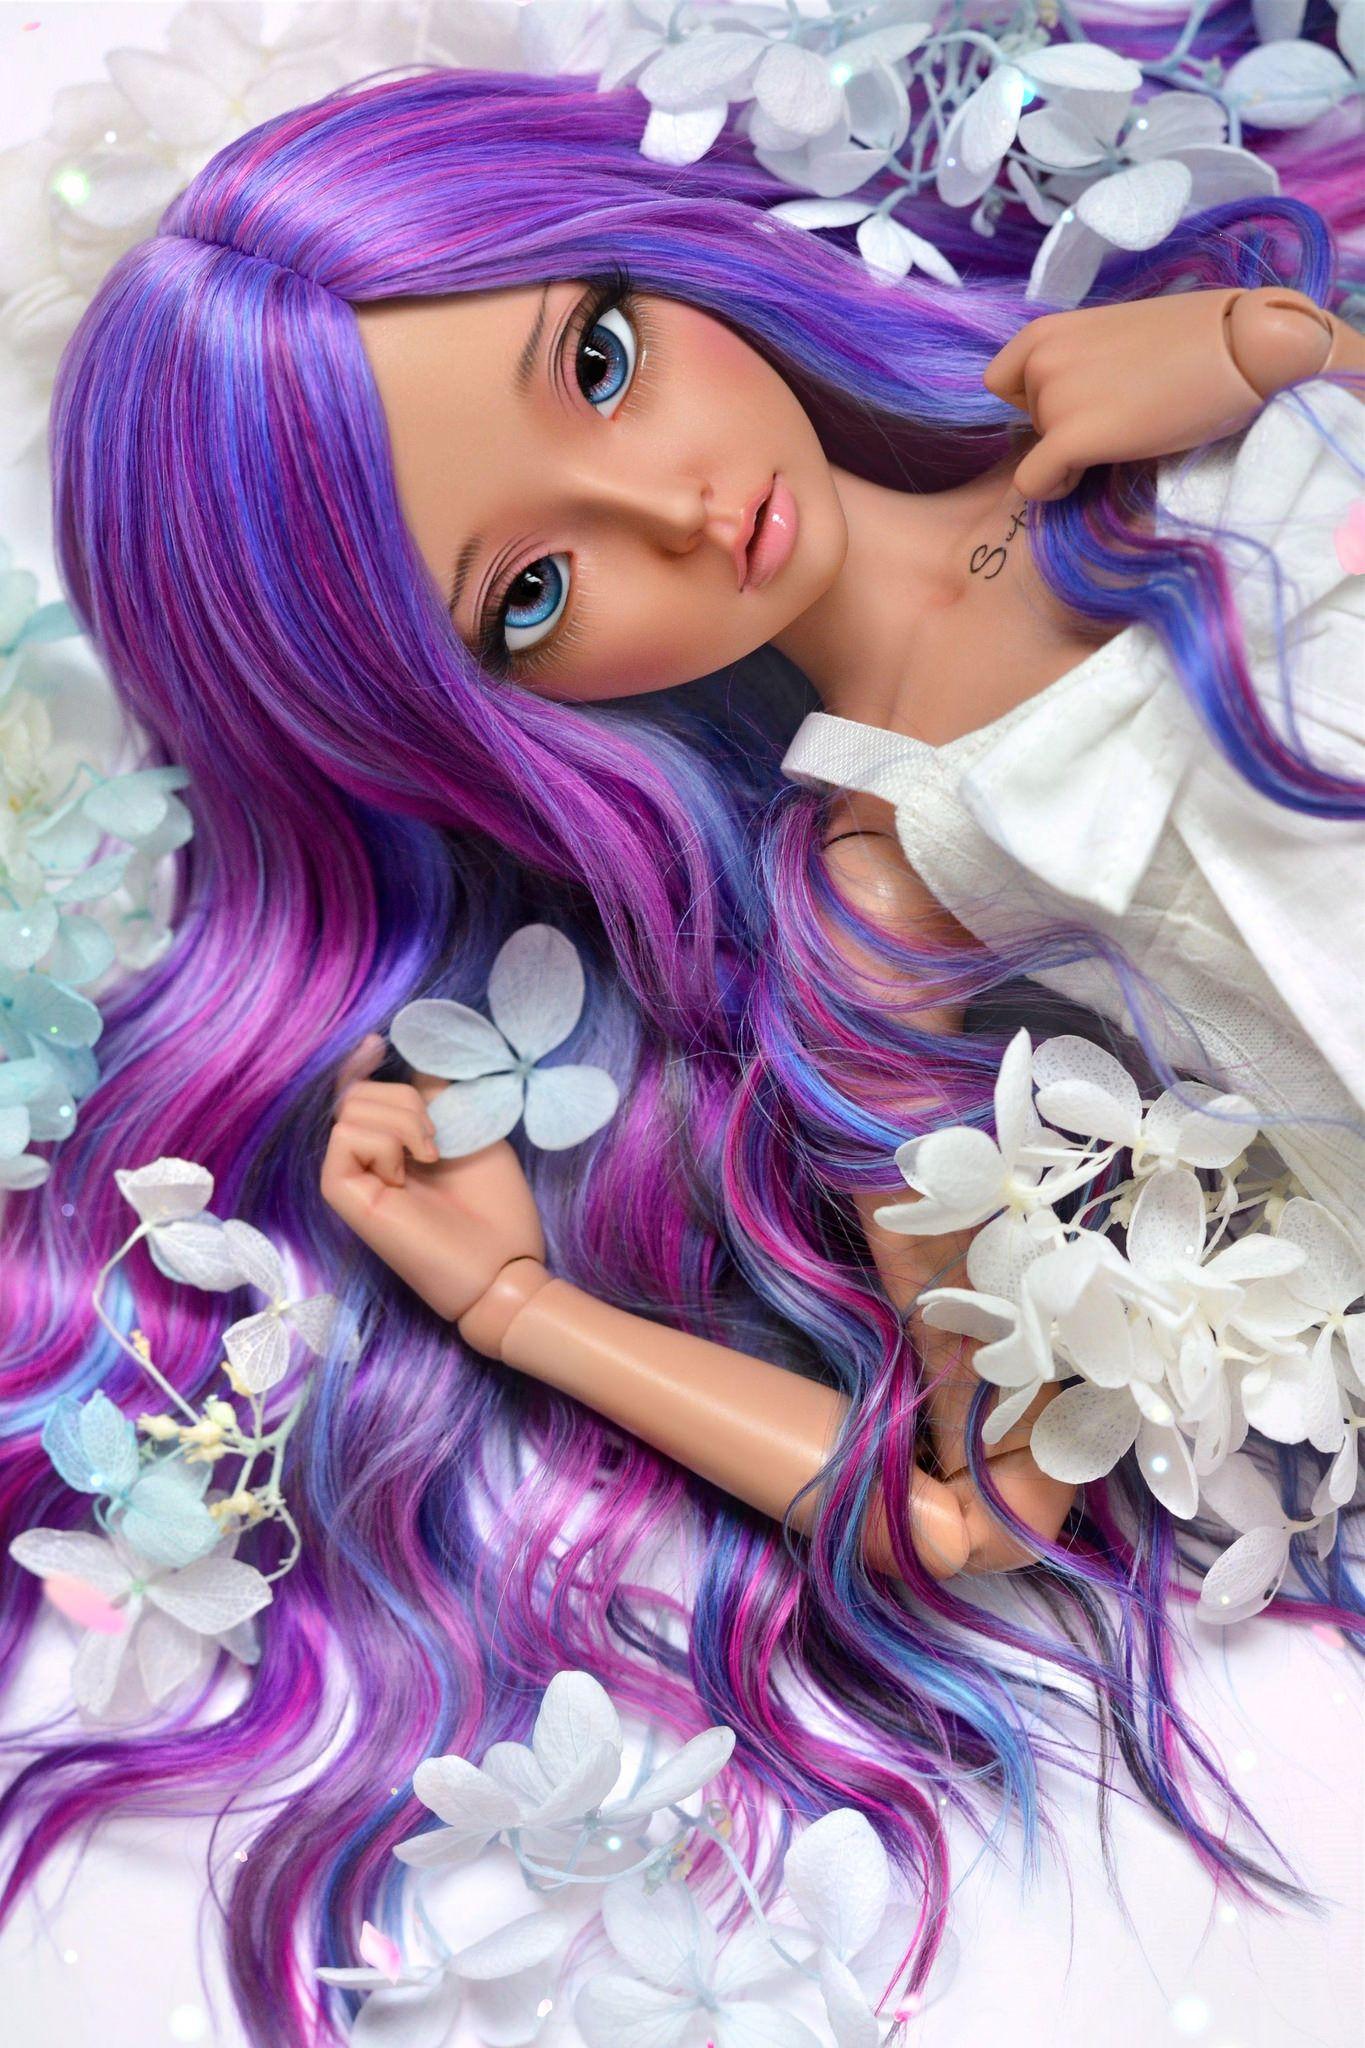 Untitled Art dolls, Beautiful dolls, Anime dolls